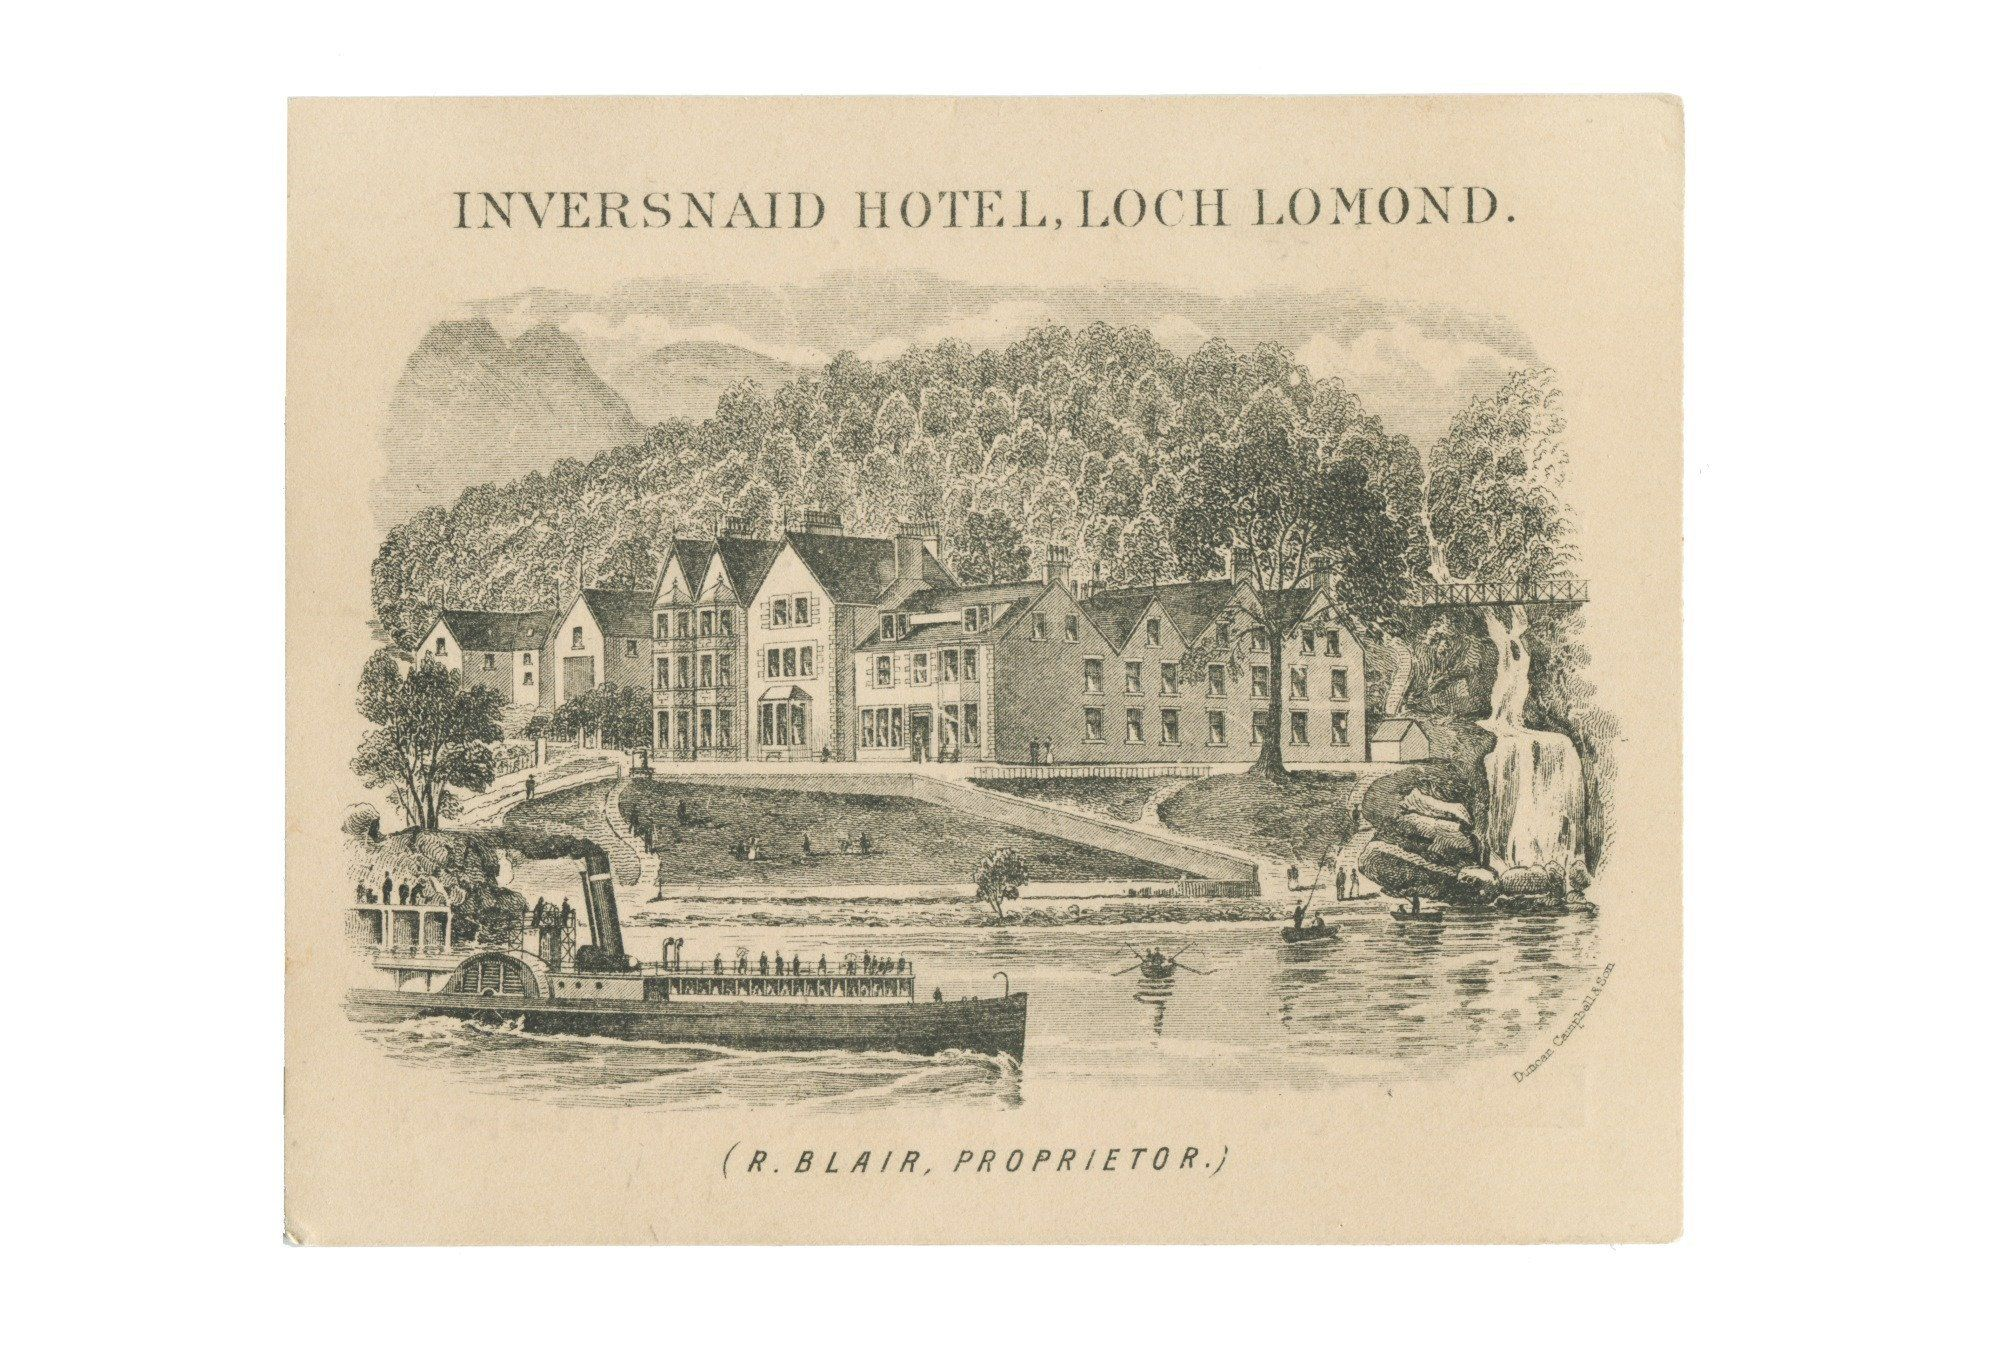 Inversnaid Hotel, Loch Lomond, Scotland, 1880s #lochlomond